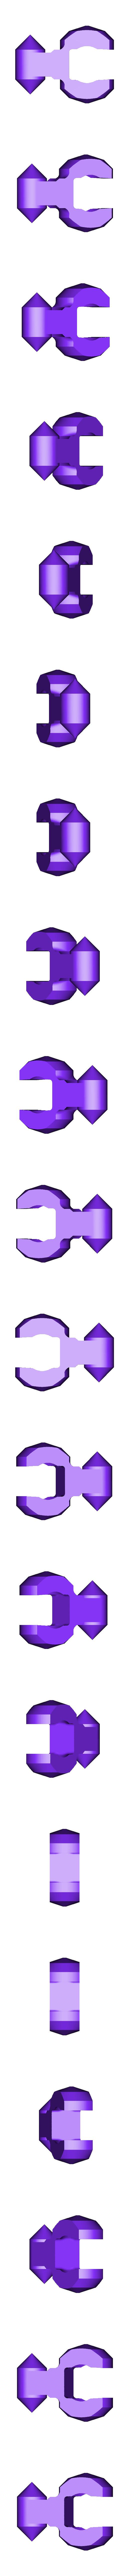 link.stl Download free STL file HeavyDuty Flexible KeyFob and Bracelet • 3D print object, hitchabout